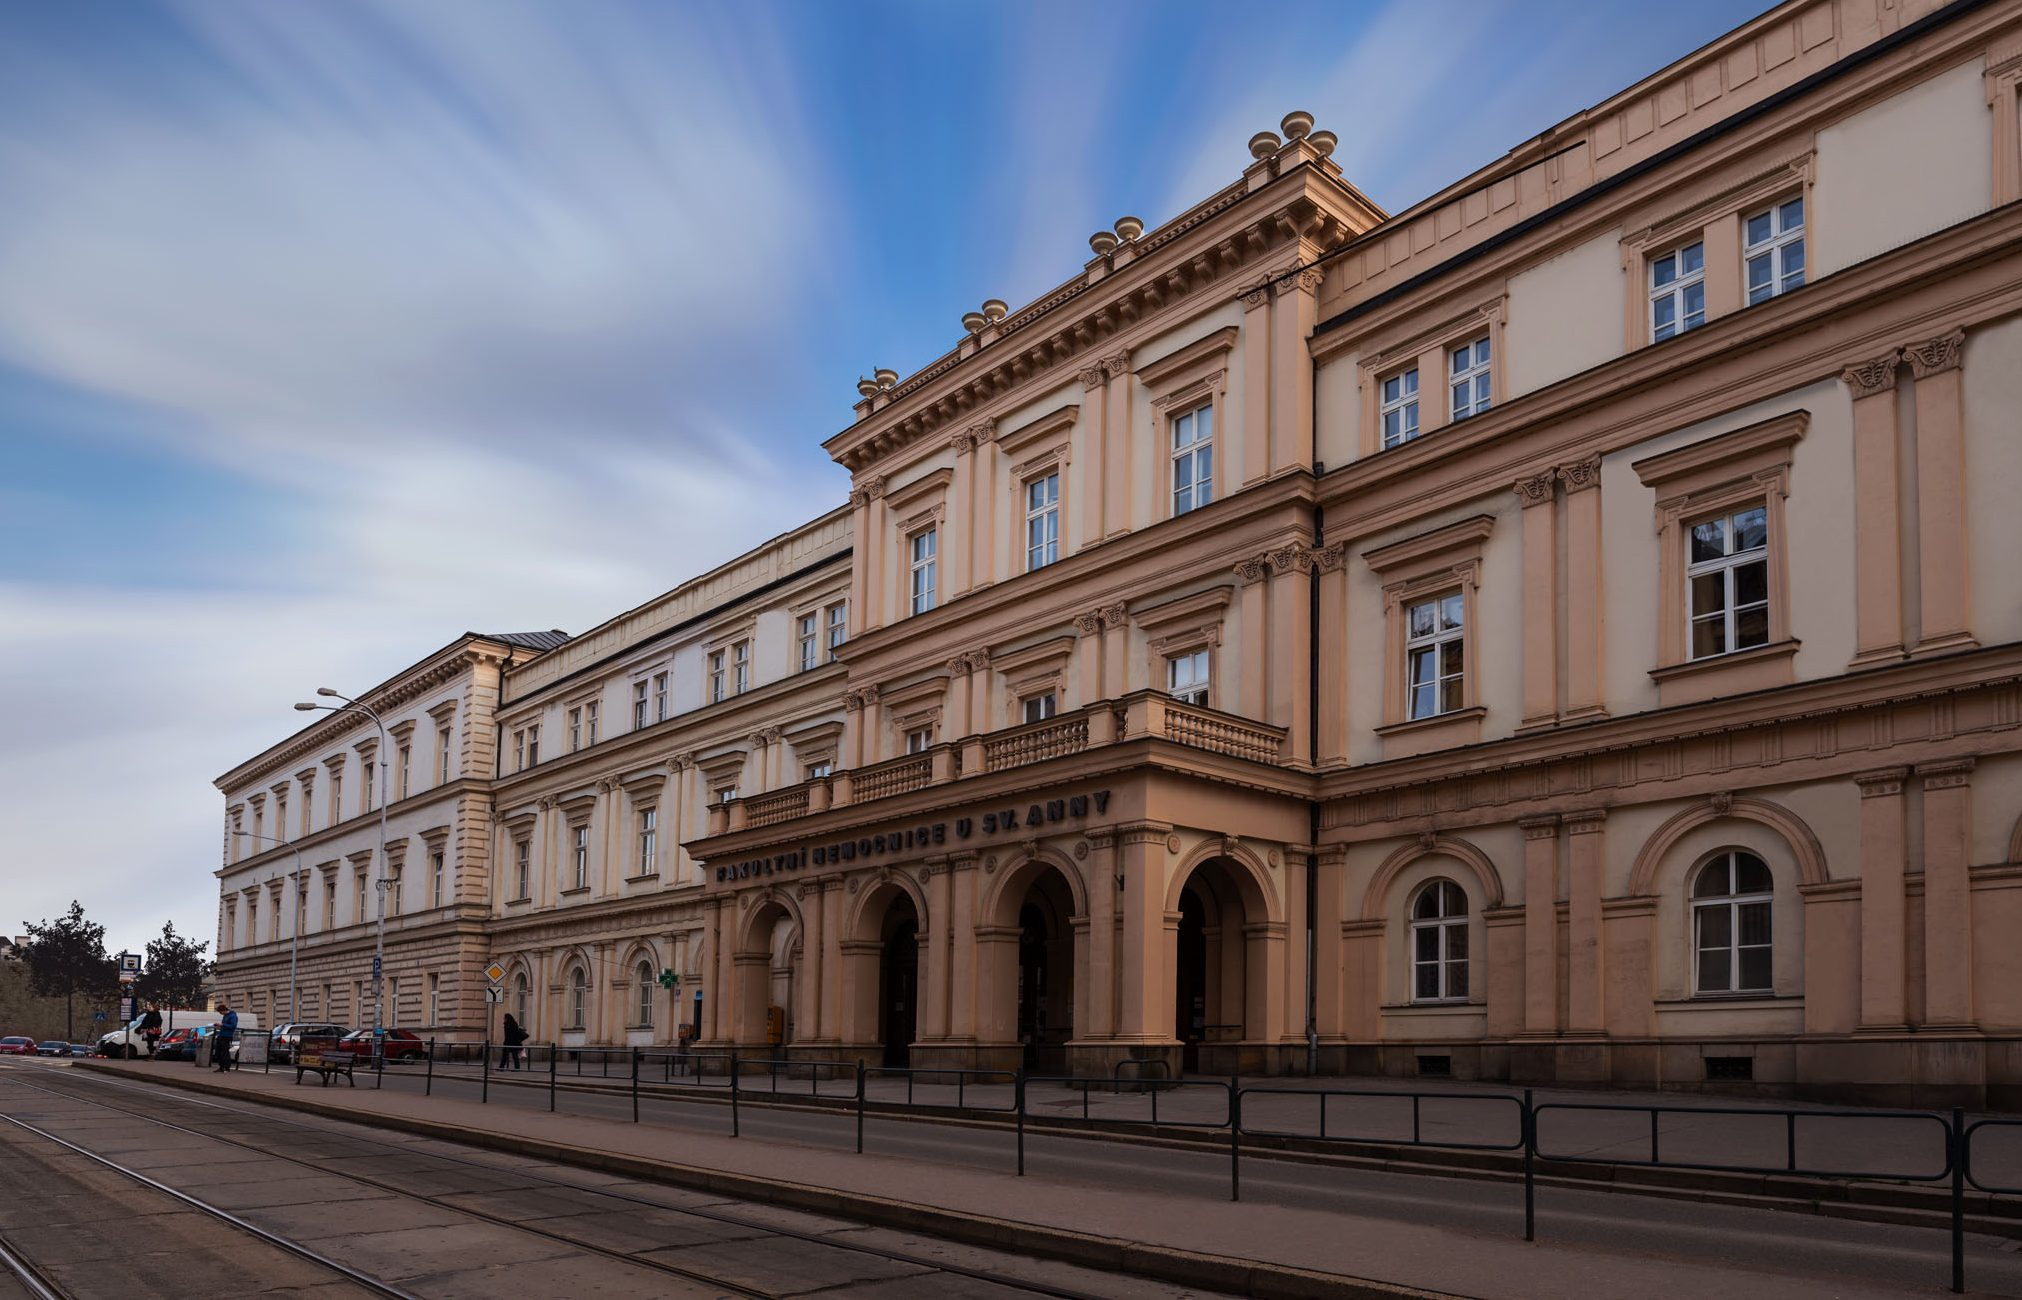 St Anne's University Hospital in Brno